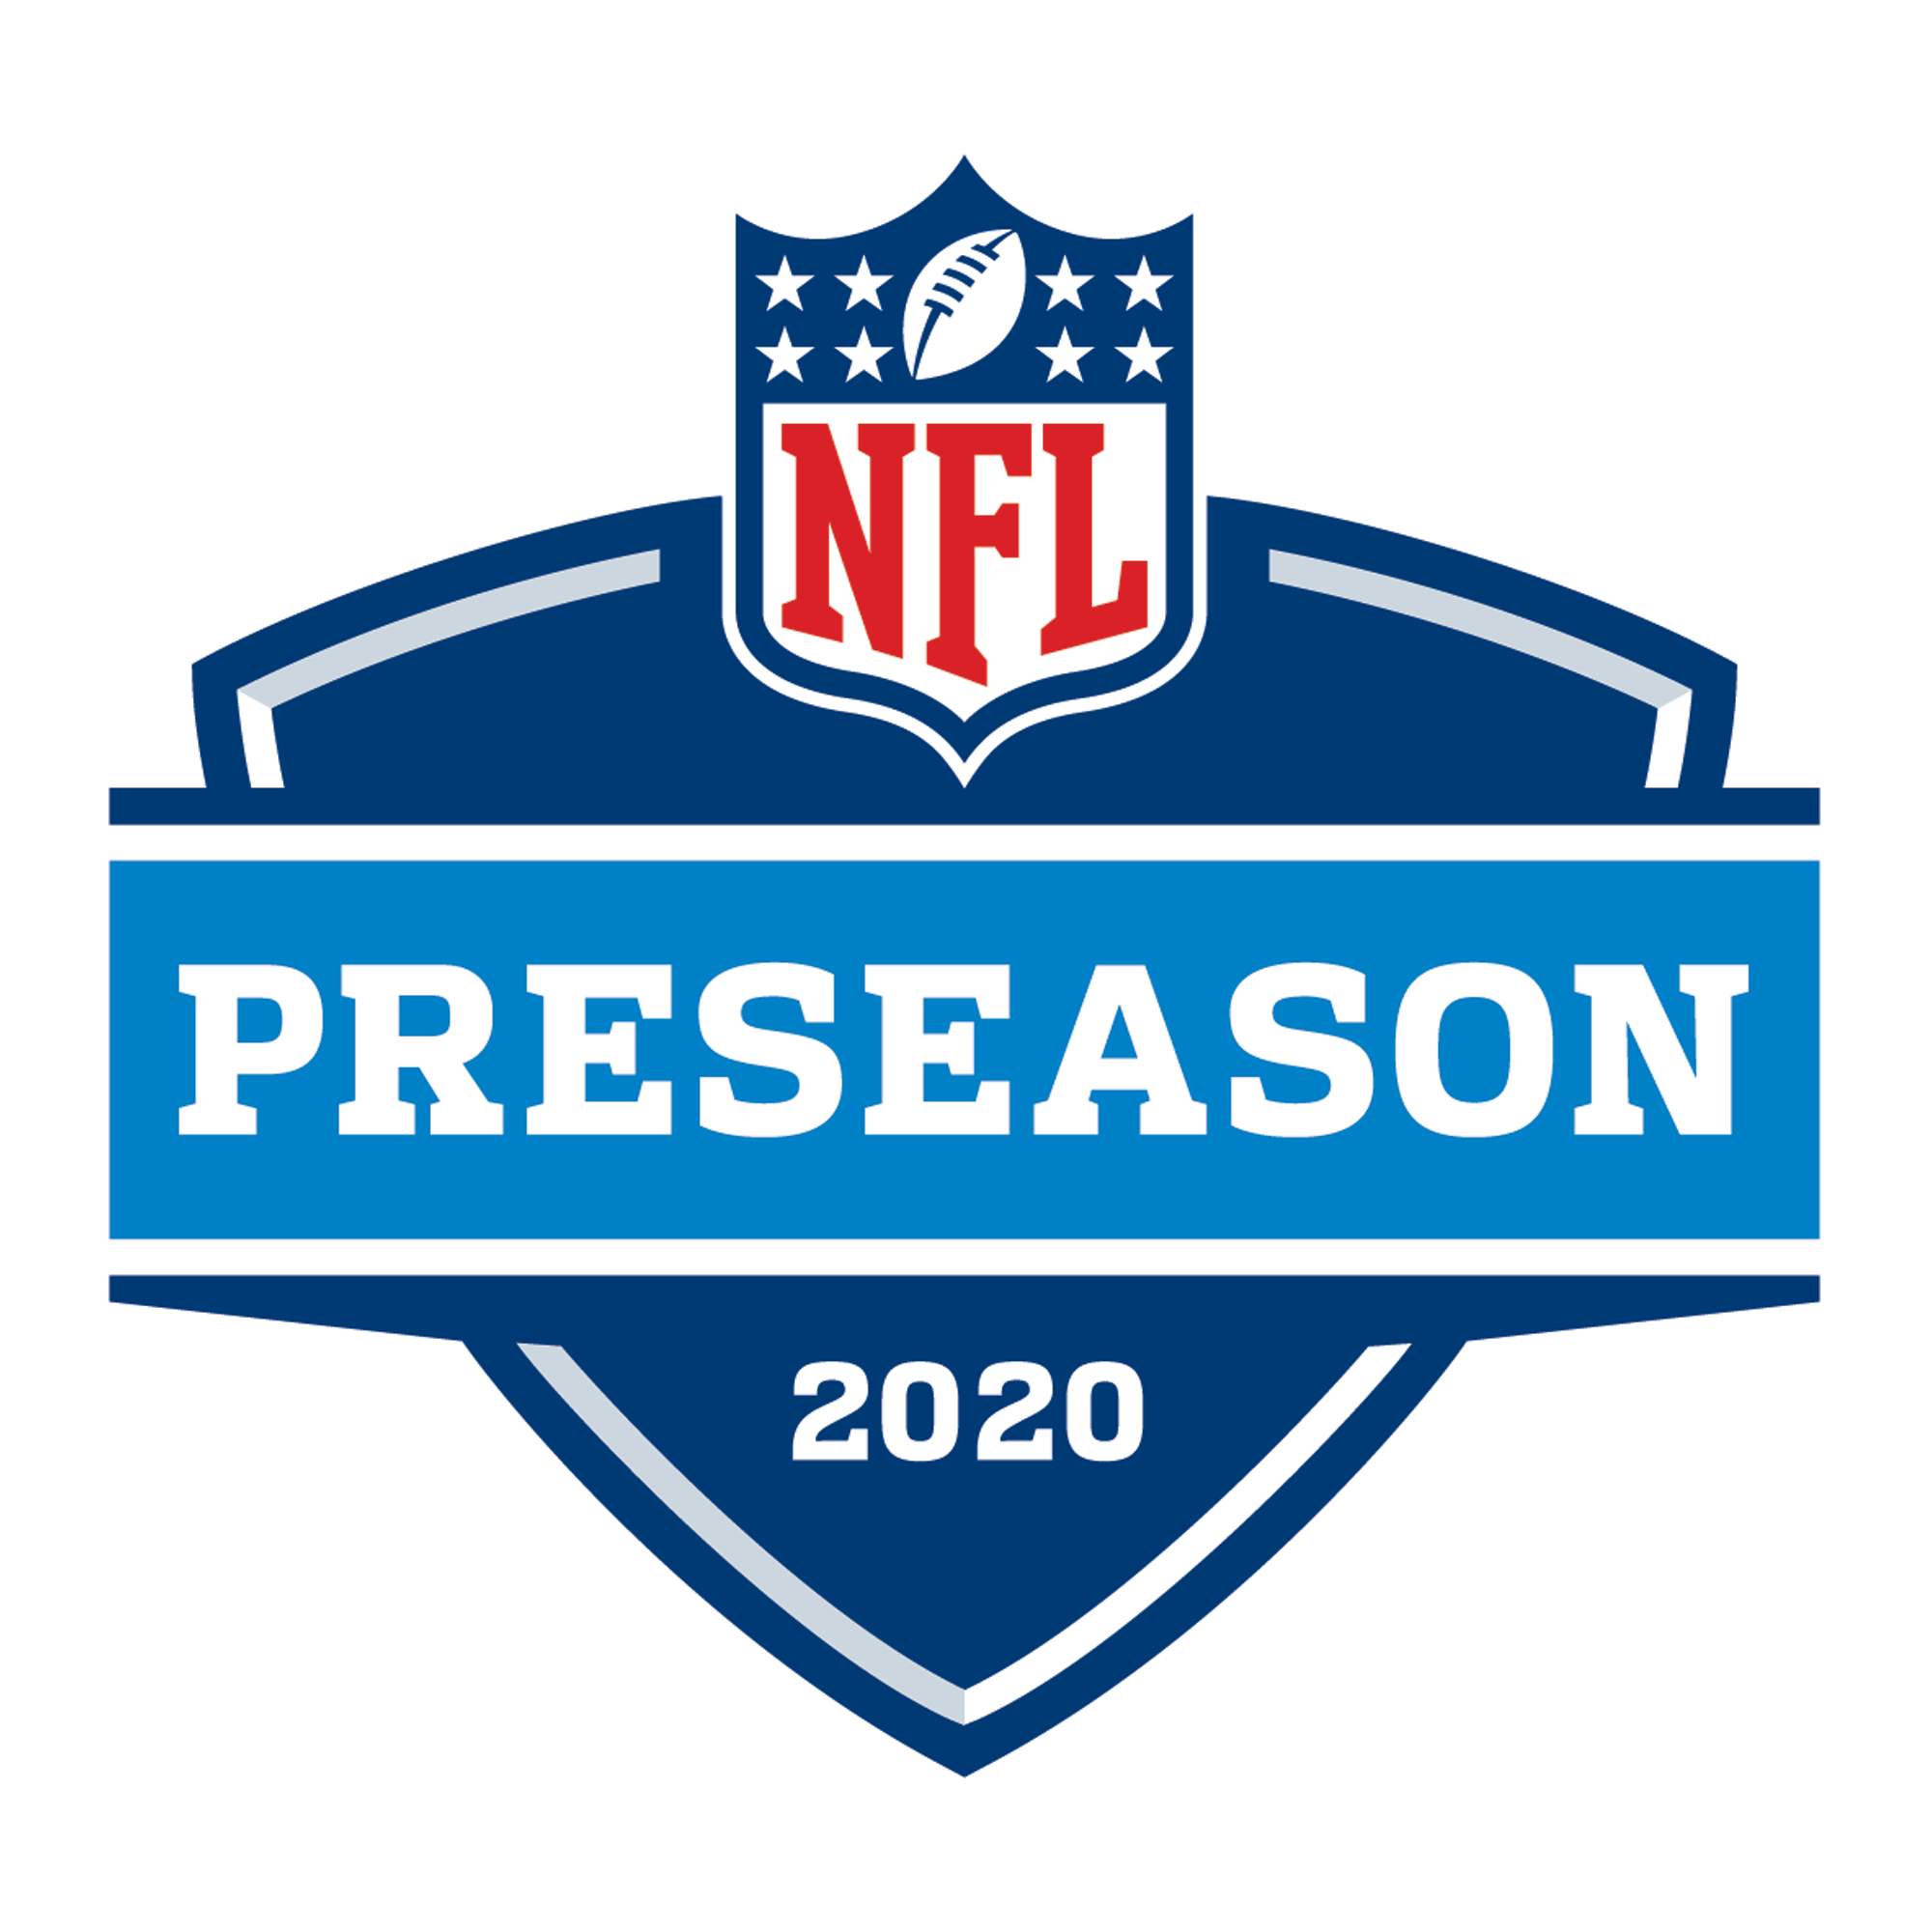 Logo_Event_Preseason_2020